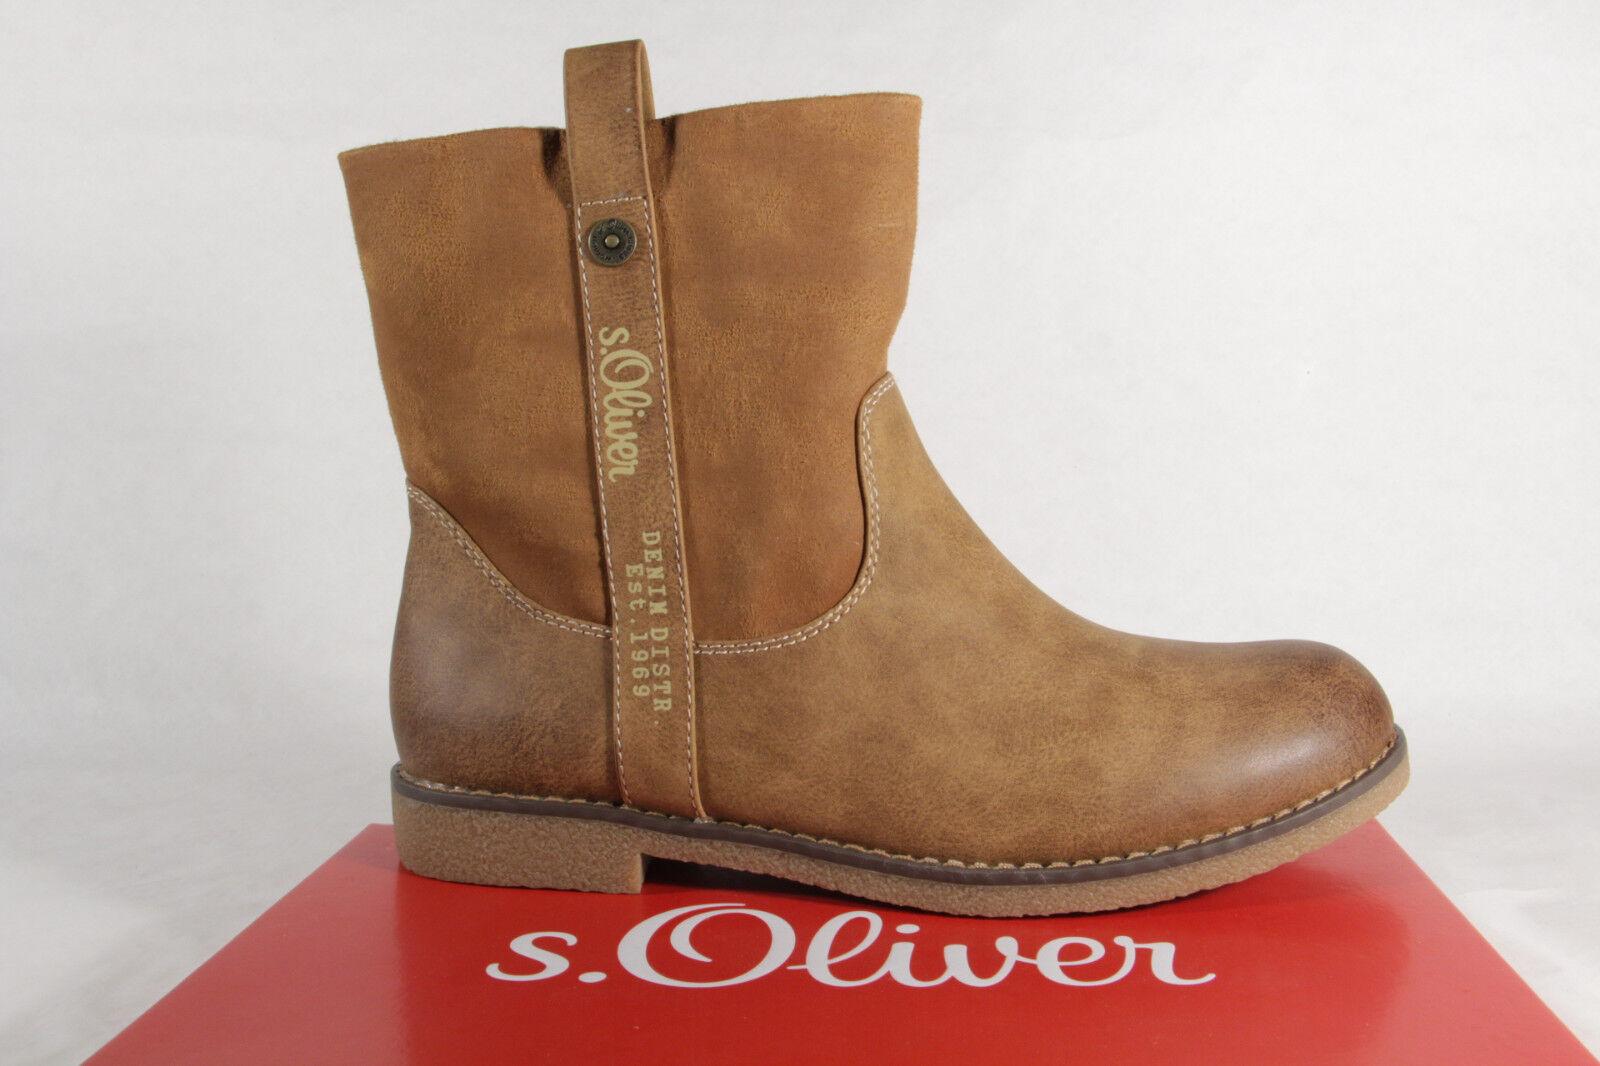 S.Oliver S.Oliver S.Oliver Damen Stiefel 26421 Stiefelette Stiefel natur braun NEU  36828a